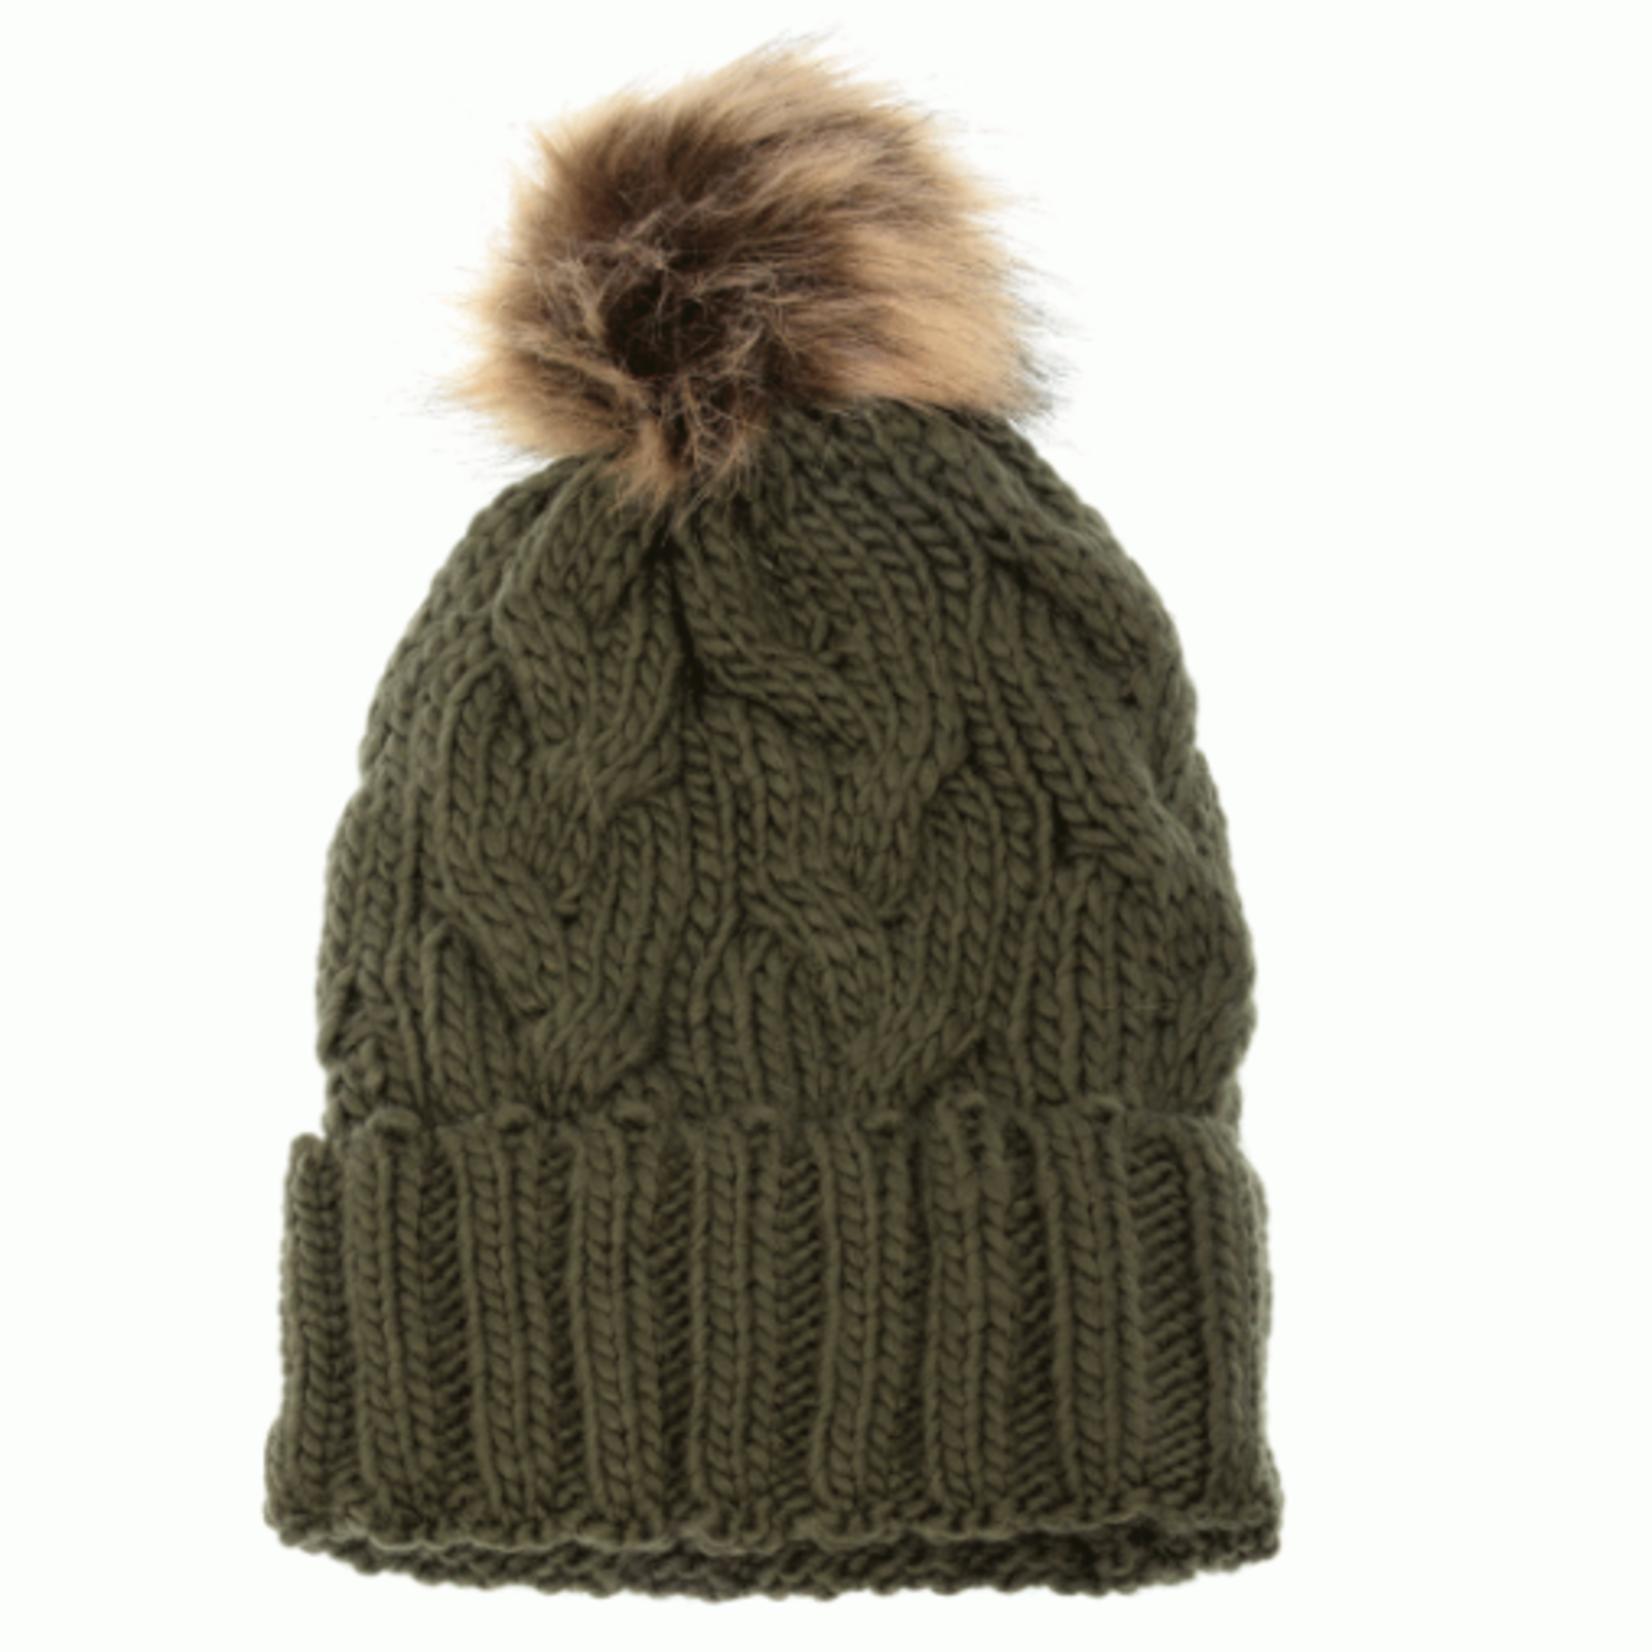 Joy Susan Joy Susan Cable Knit Pom Pom Hat